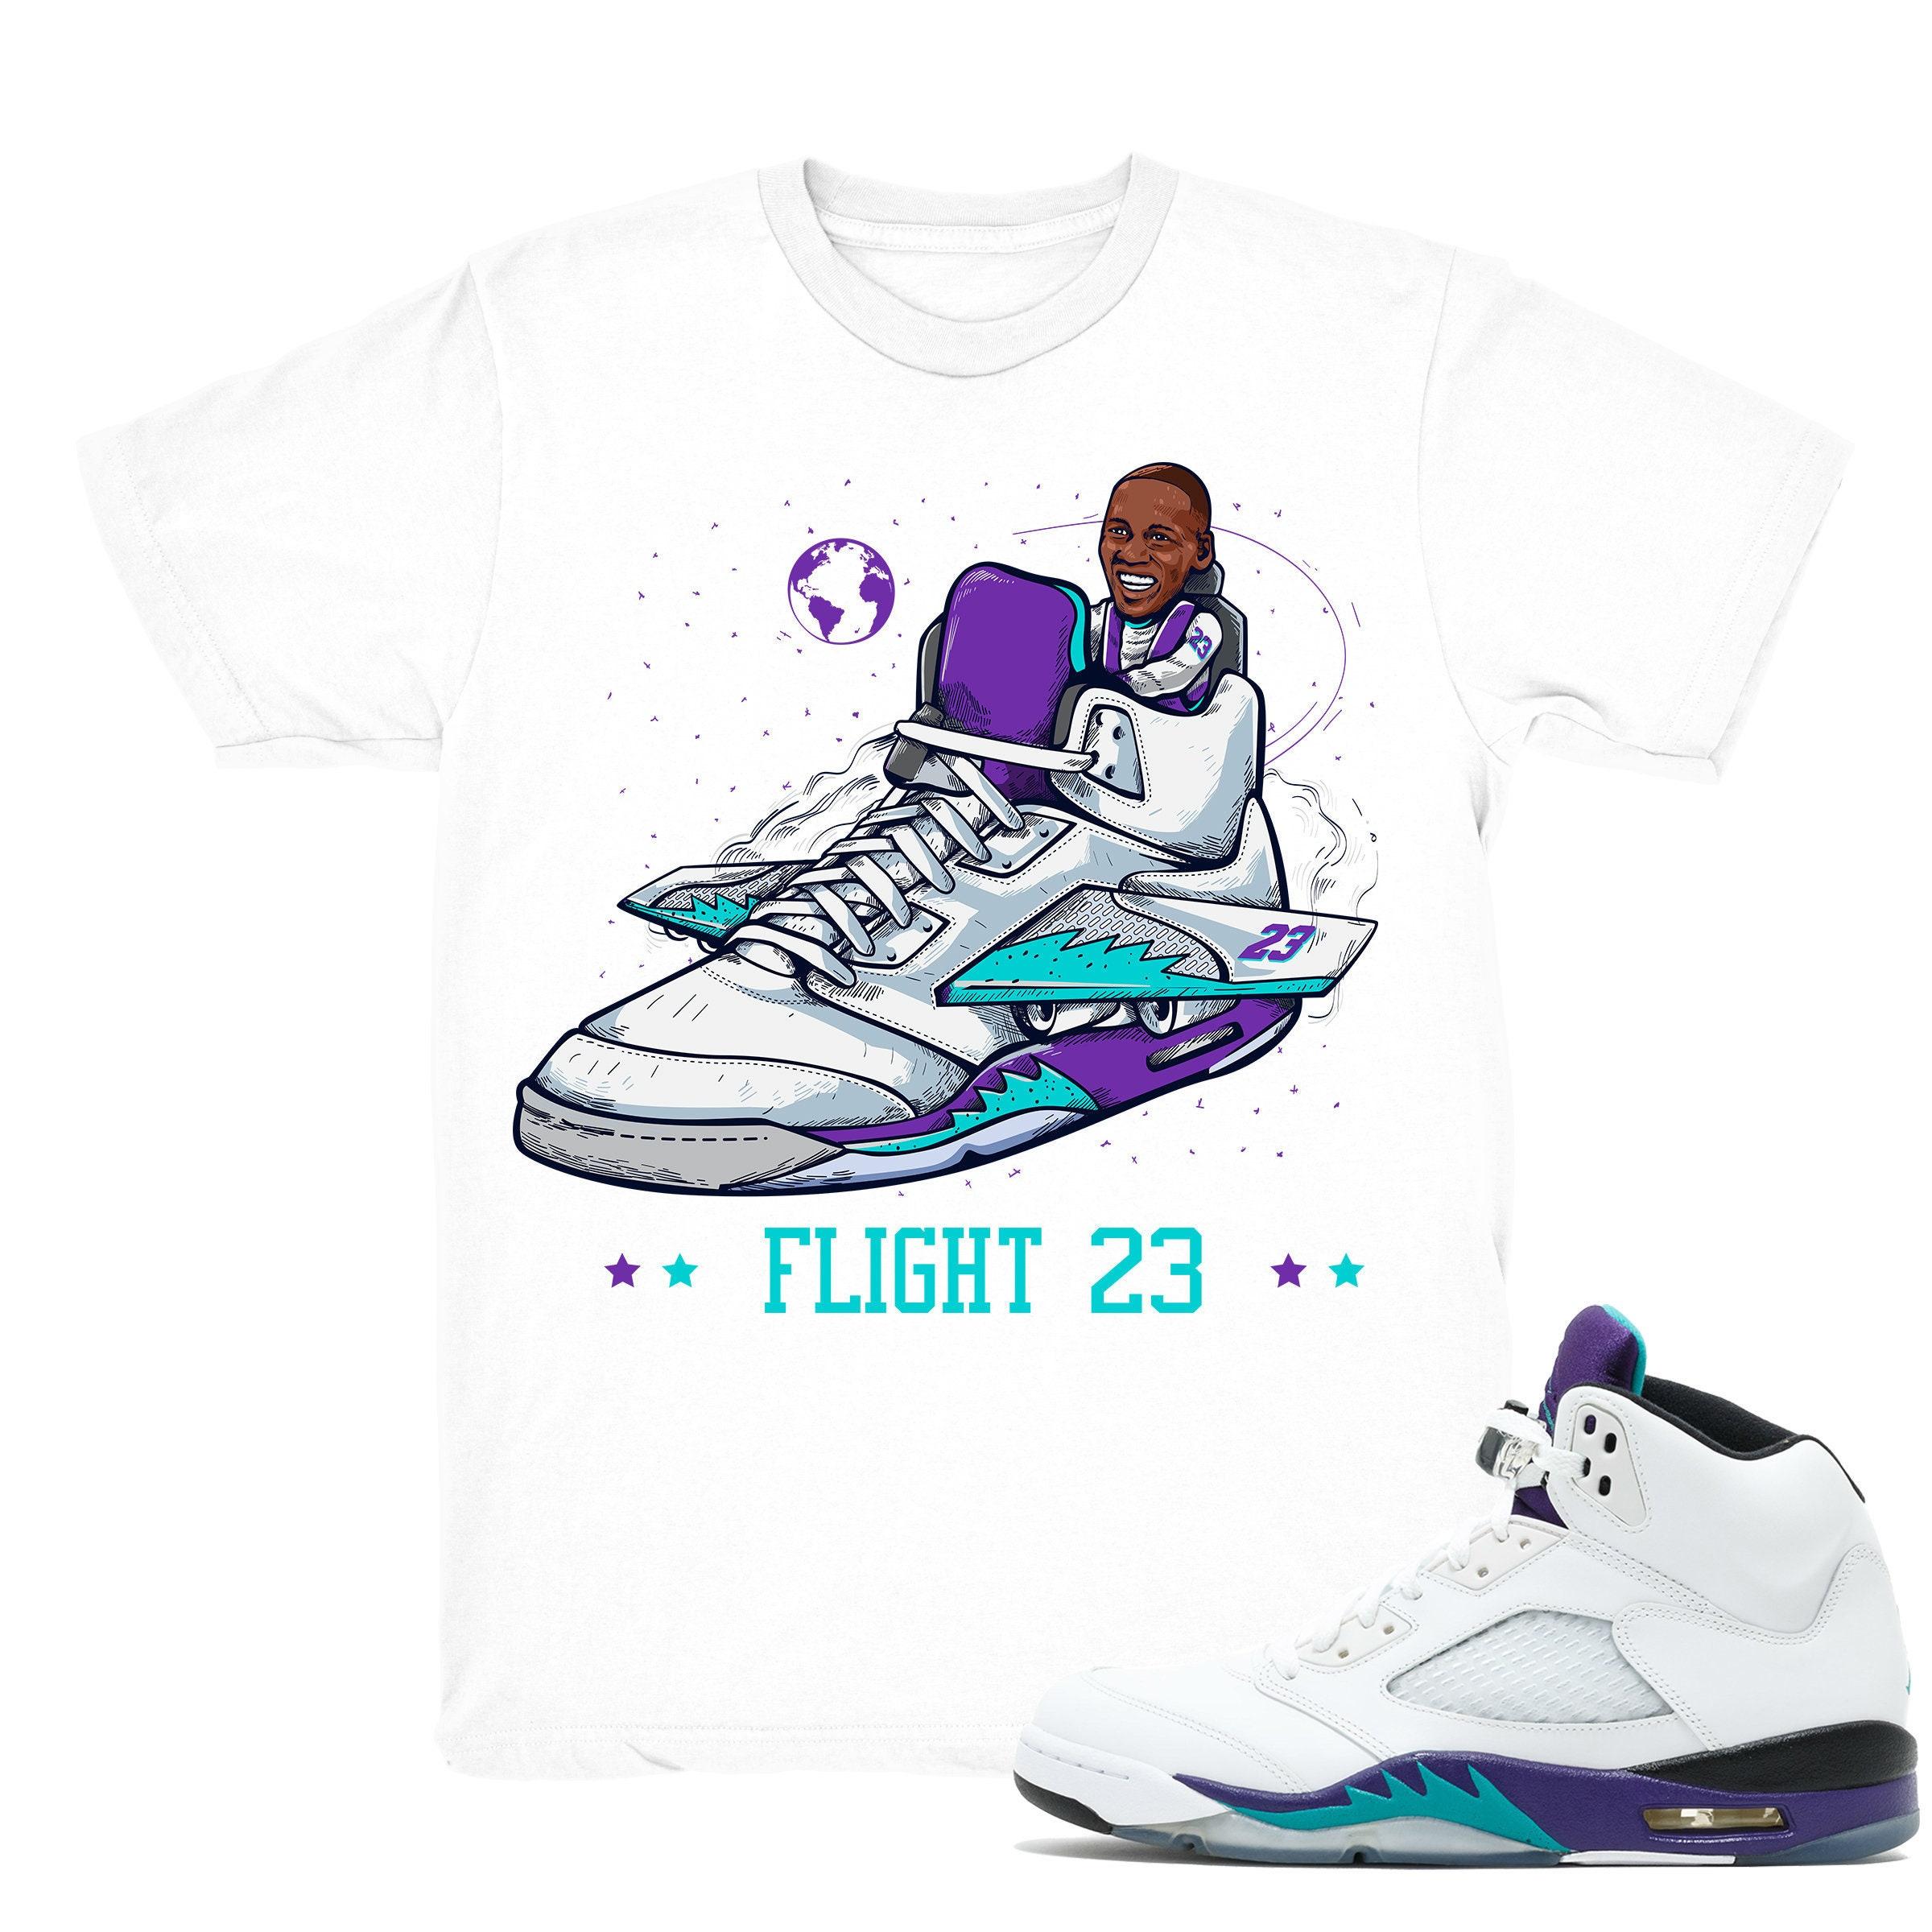 new concept f2038 102ff Air Jordan 5 Grape shirt | Flight 23 - Retro 5 Fresh Prince Grape tee shirts